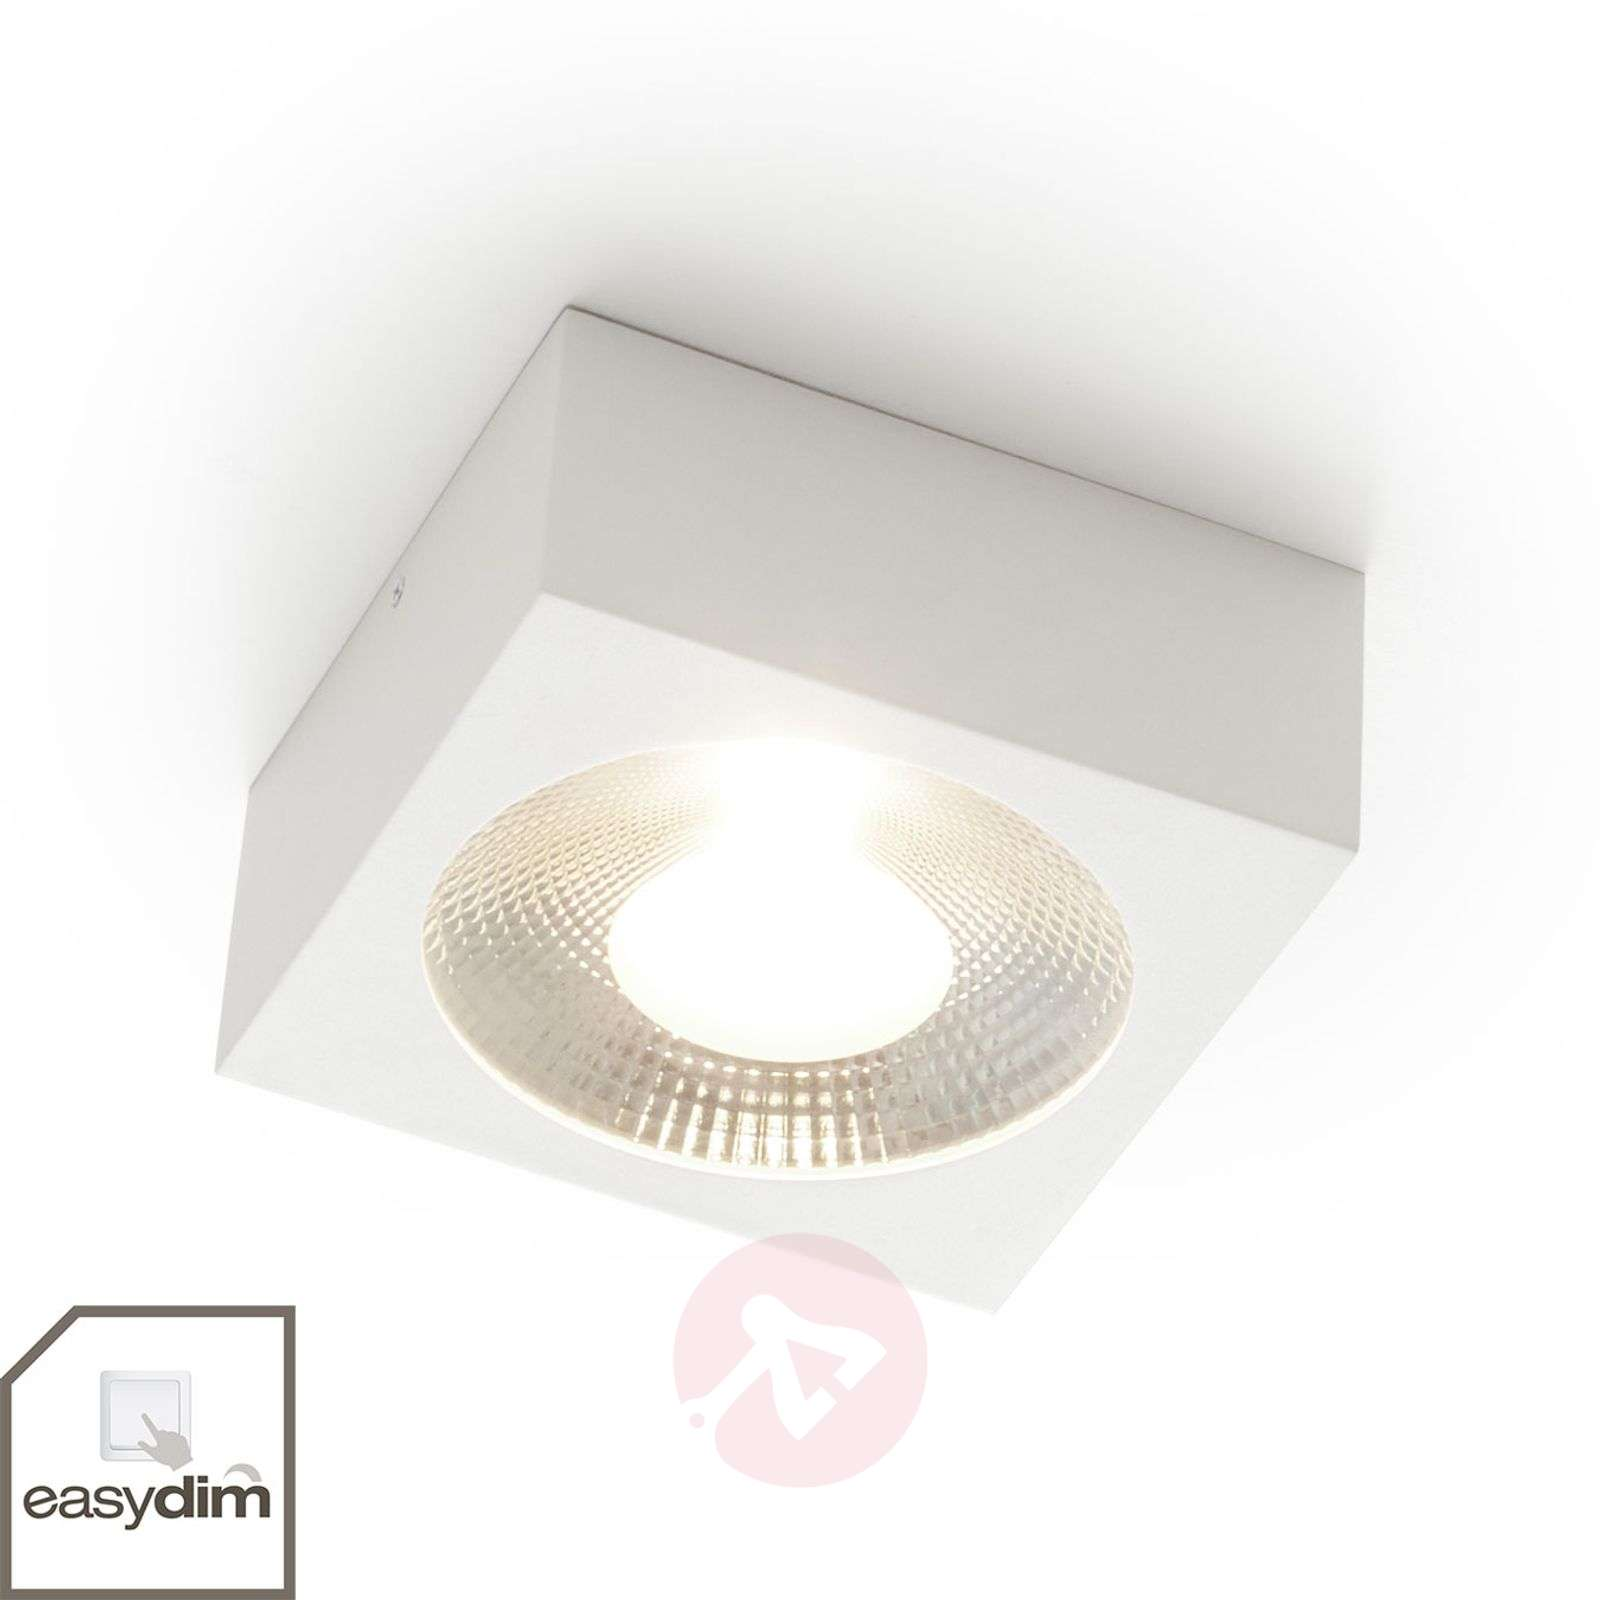 LED-kattovalaisin Sonja, Easydim-tekniikka-1558146-02